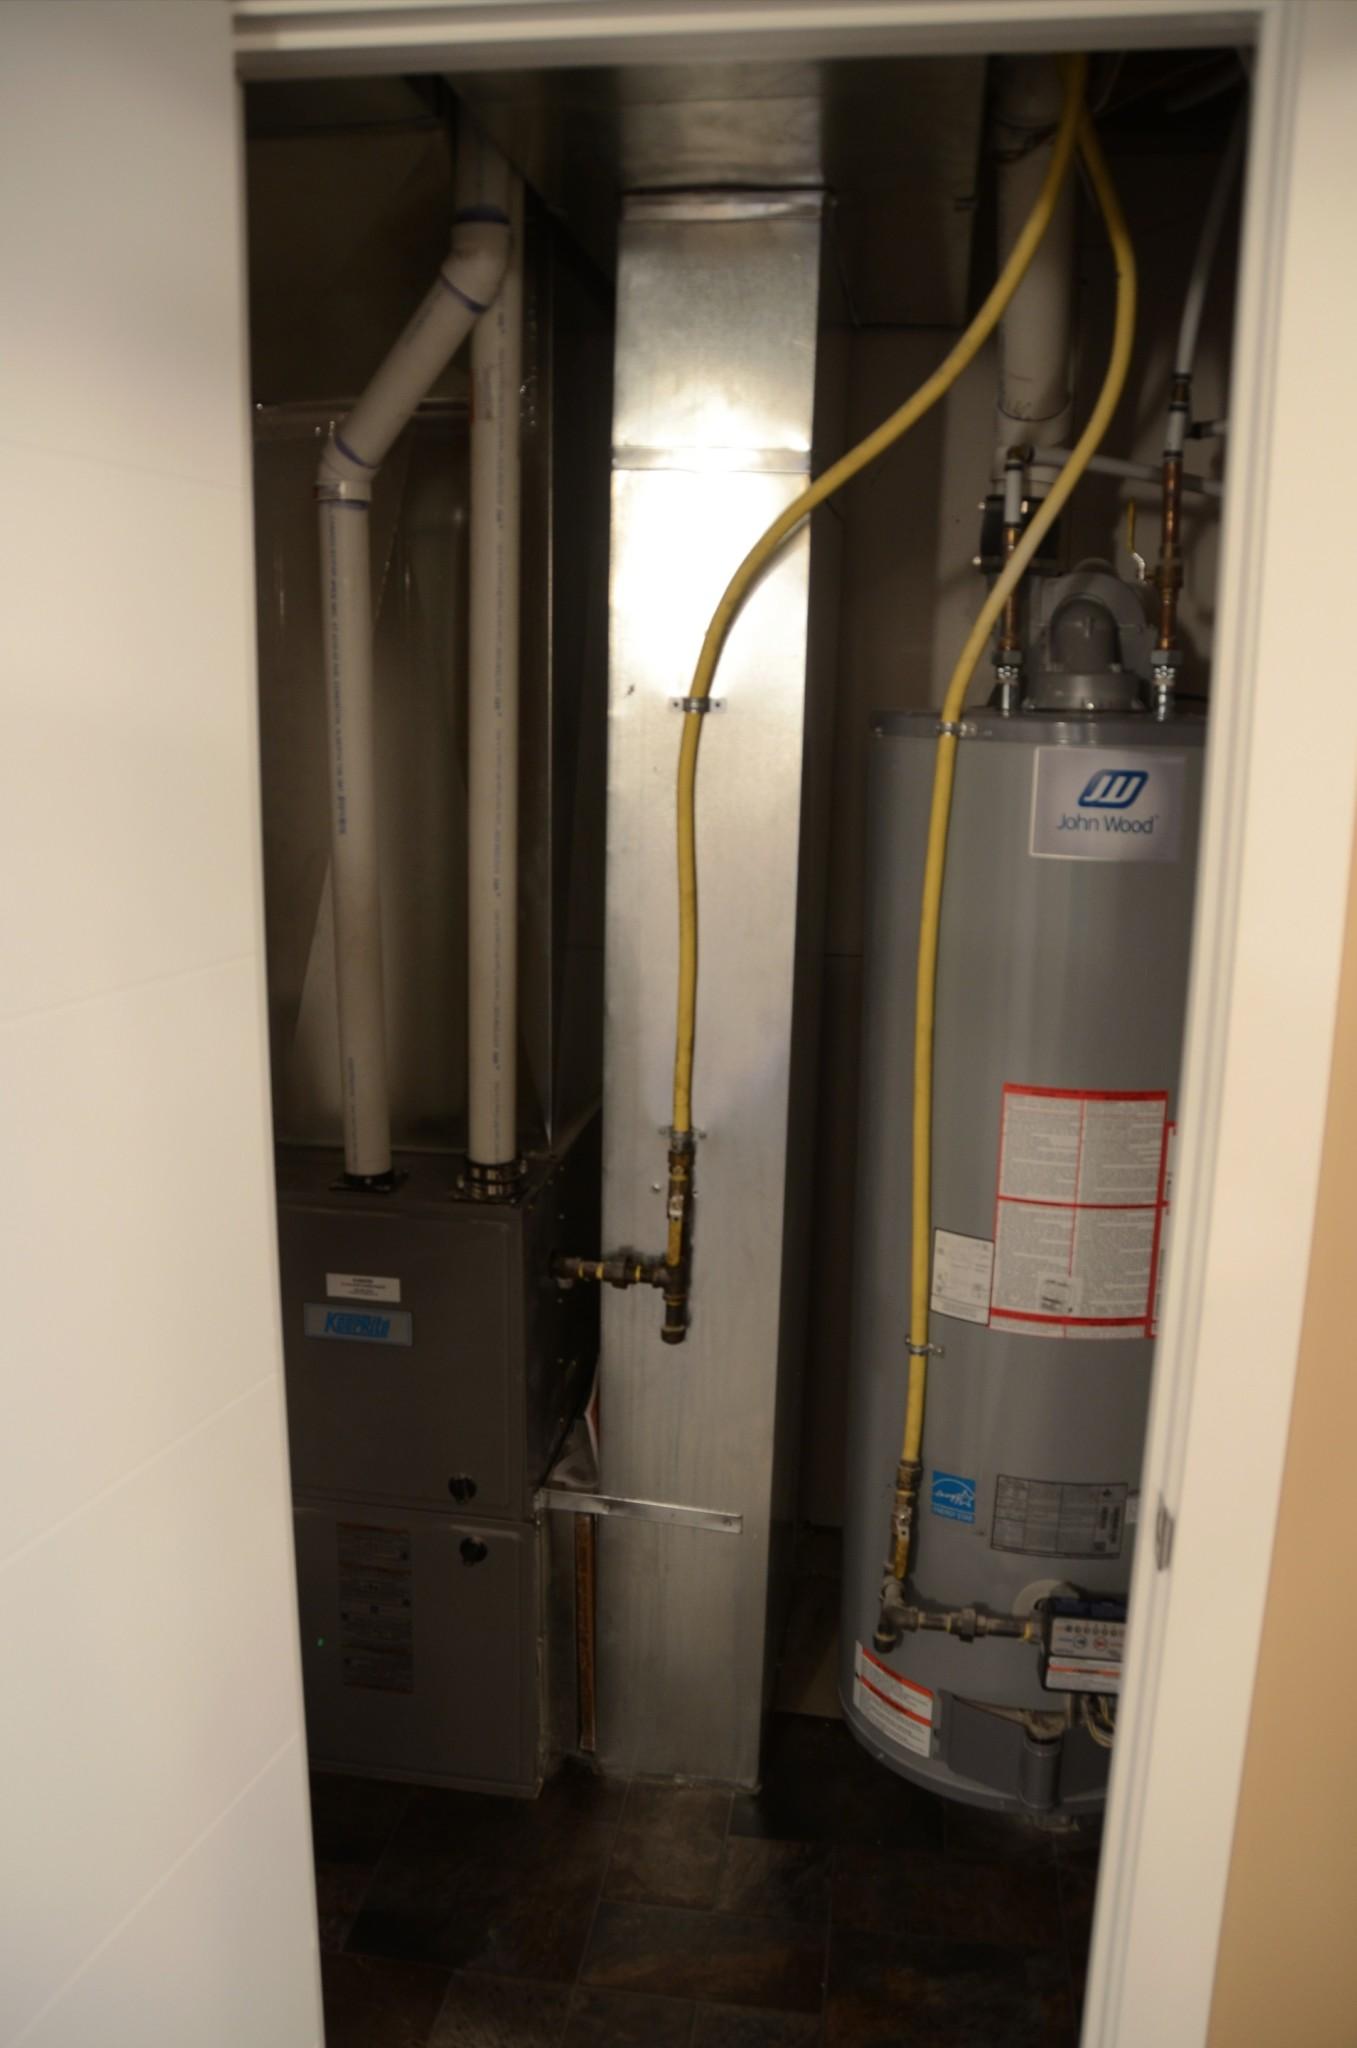 10-13307 Hot Water tank